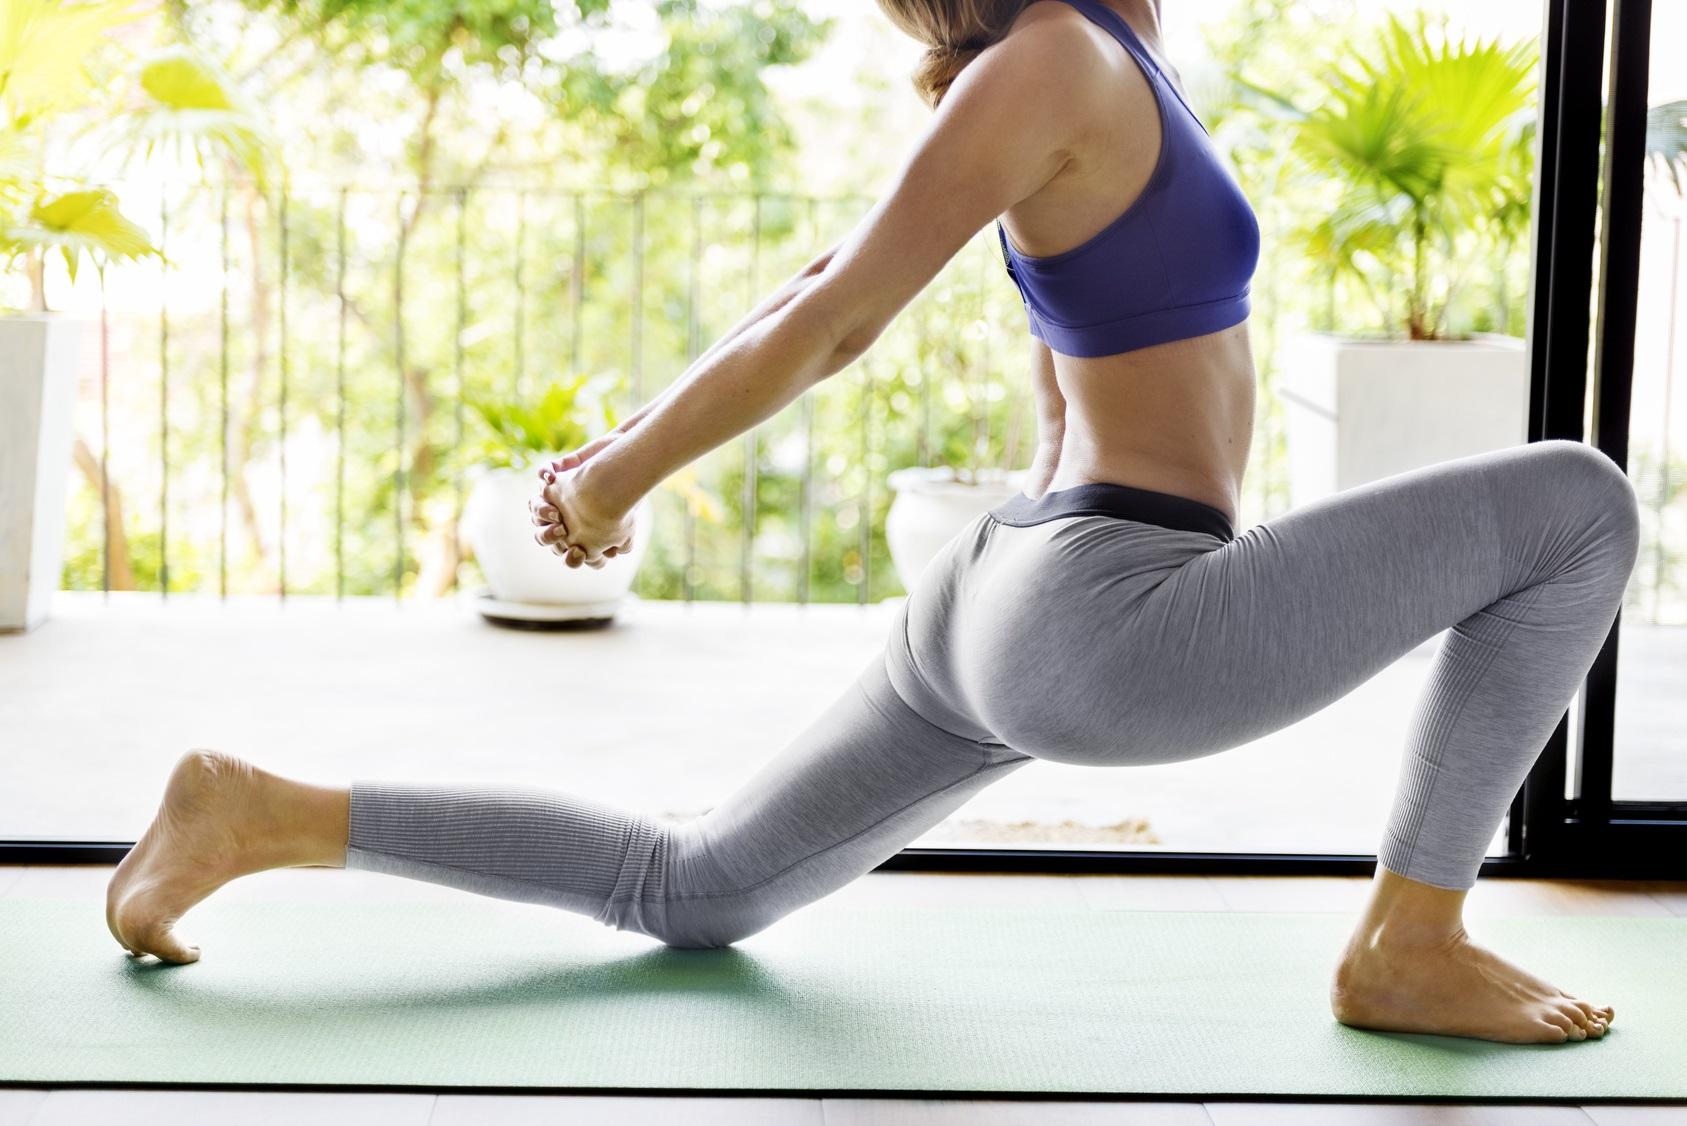 Woman Yoga Practice Pose Training Concept